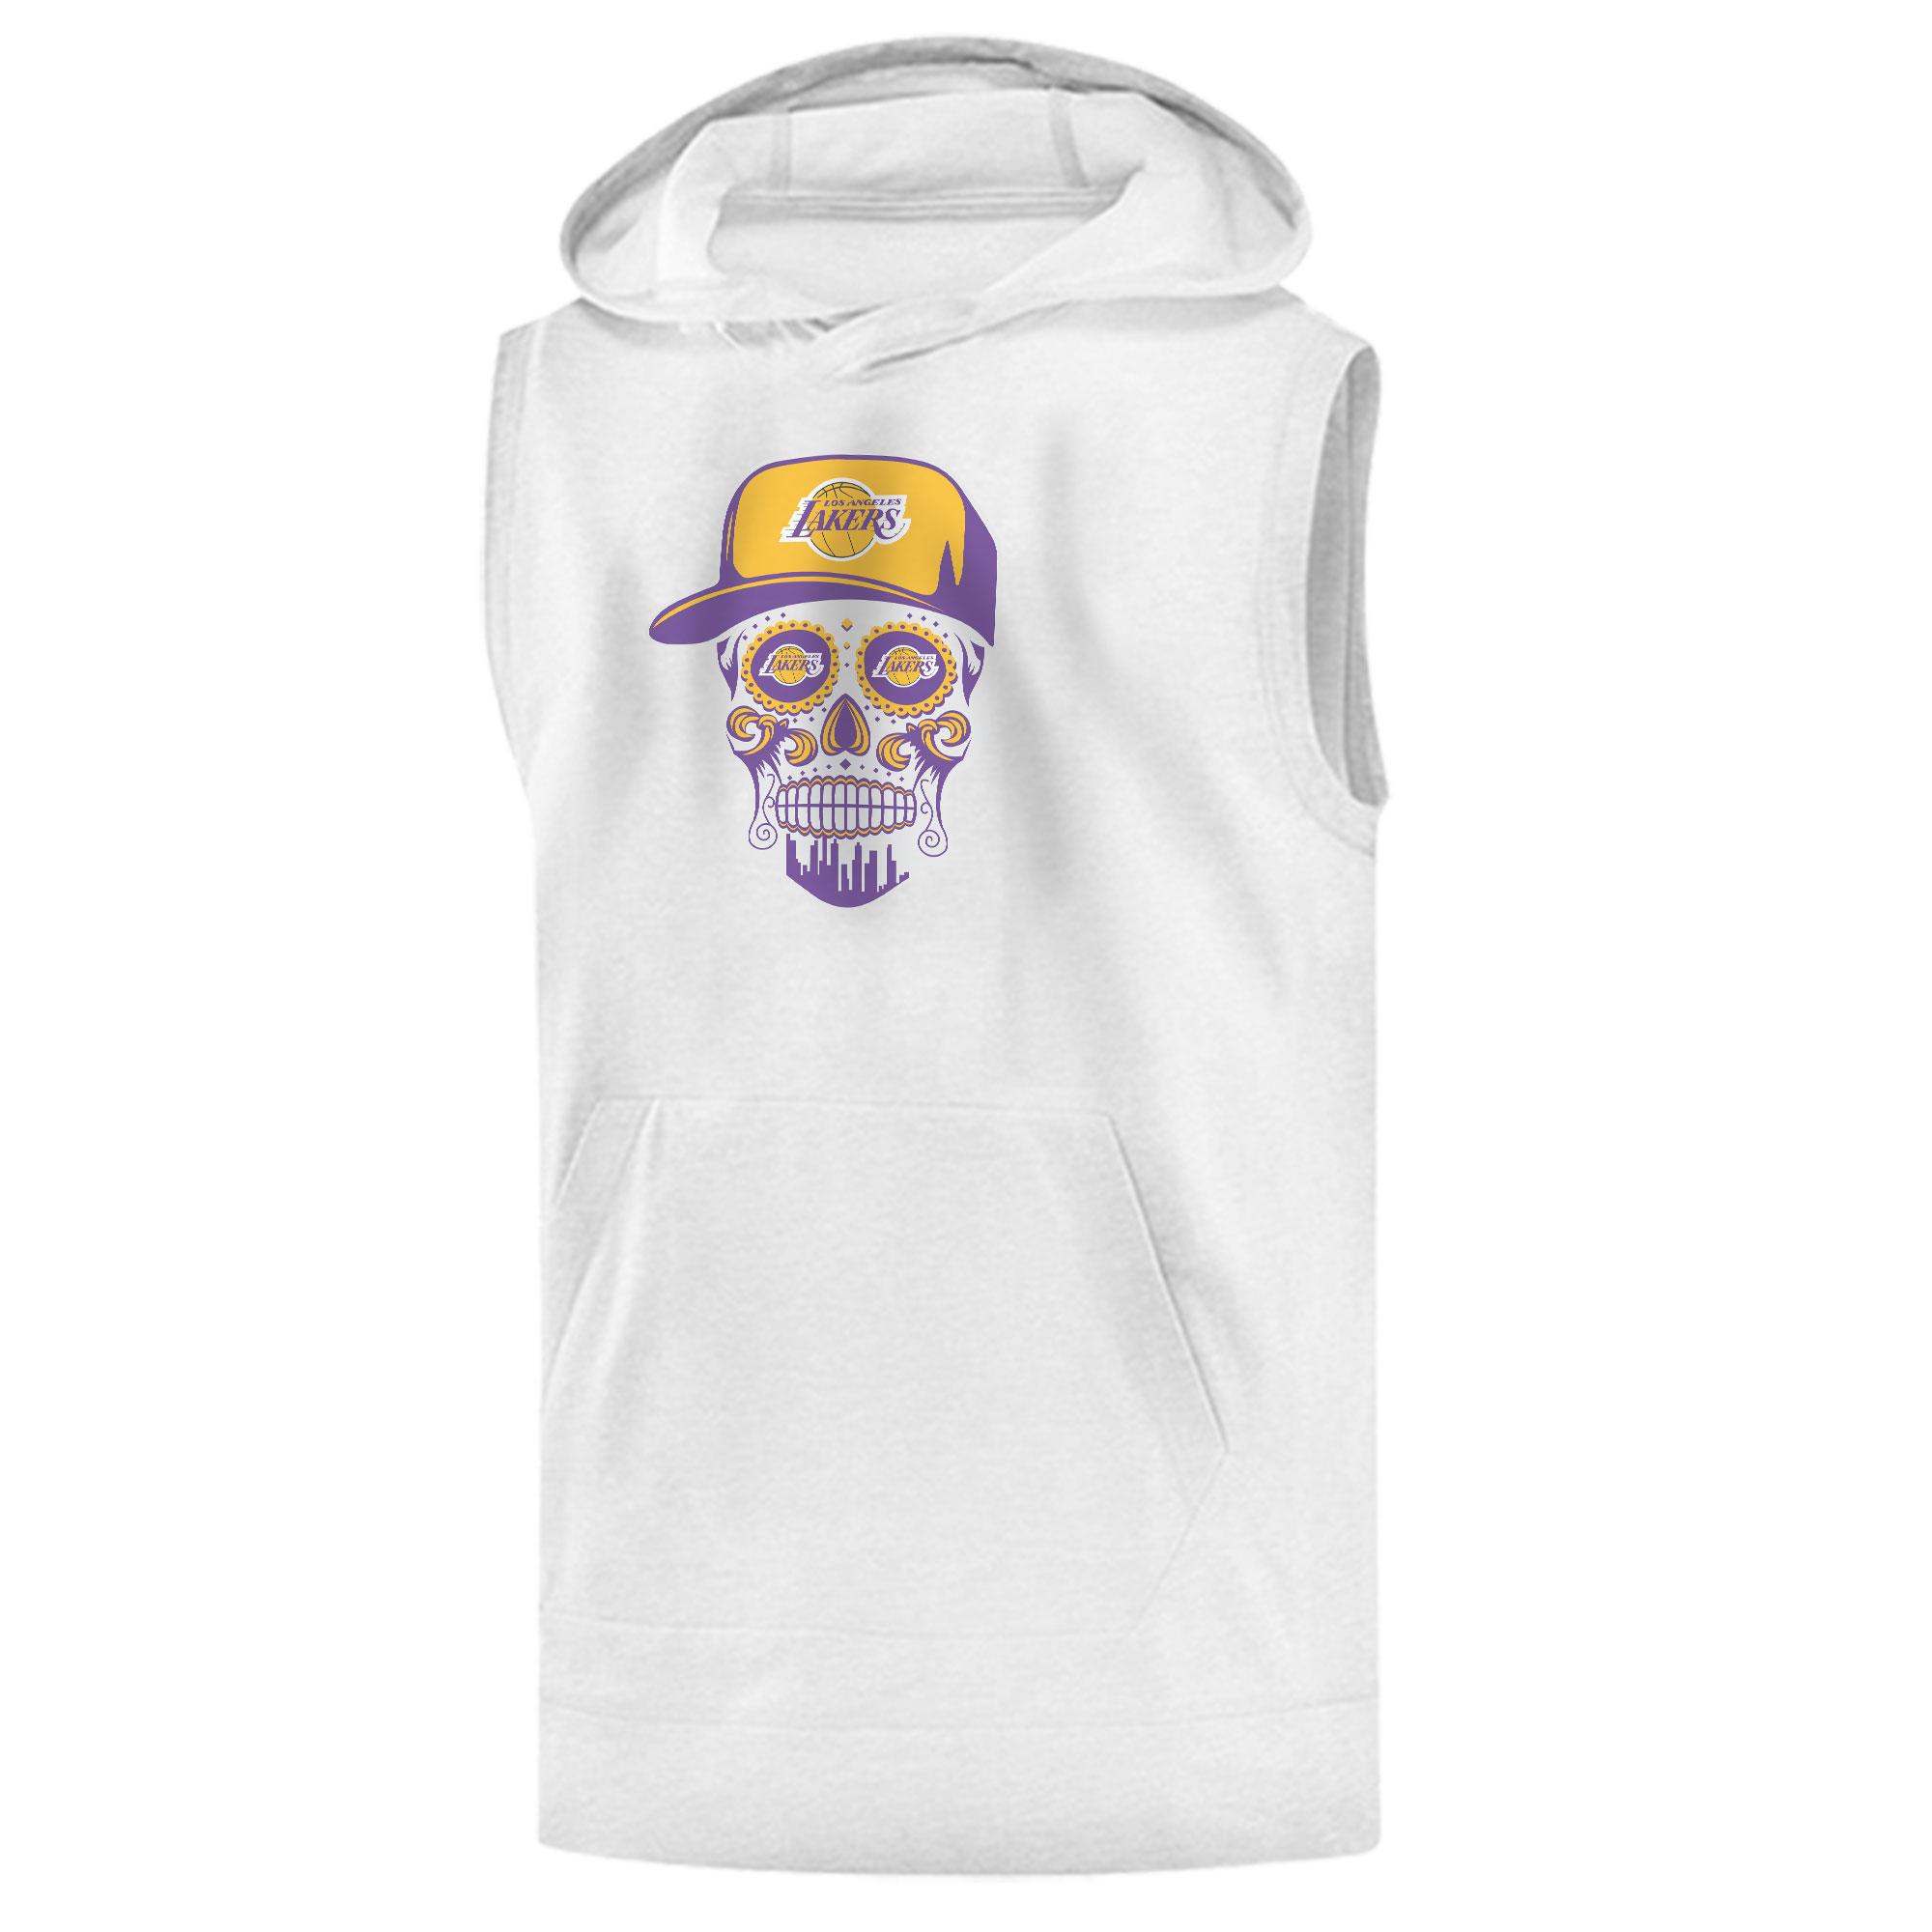 Lakers Skull Sleeveless (KLS-WHT-NP-454-NBA-LKRS-SKULL)